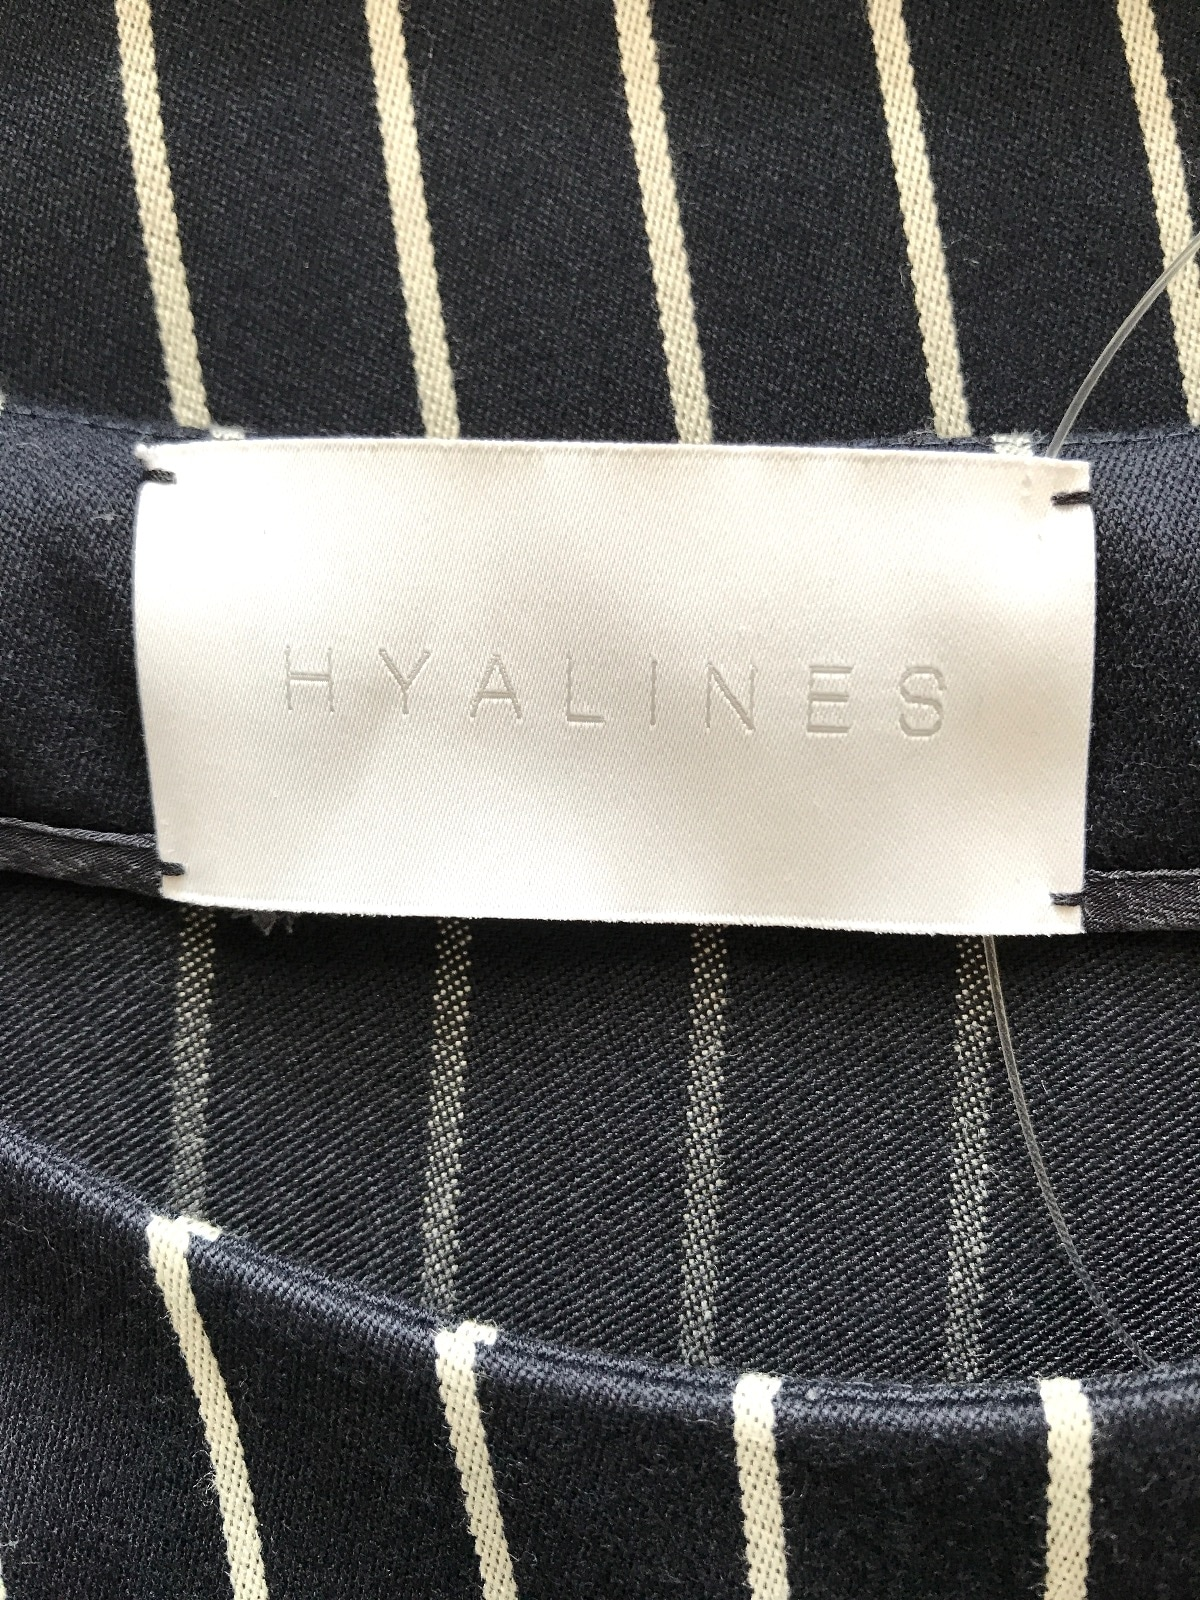 HYALINES(ハイアリン)のチュニック